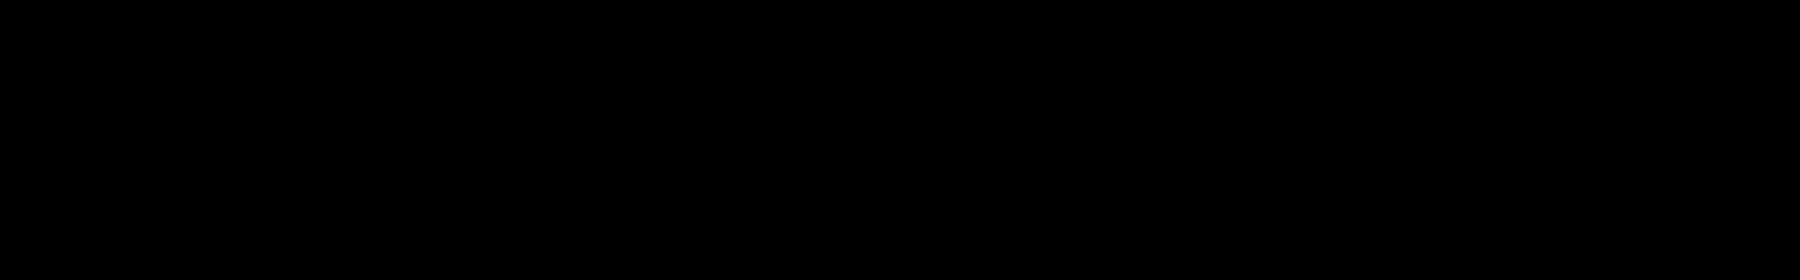 Abstract Lo-Fi 3 audio waveform